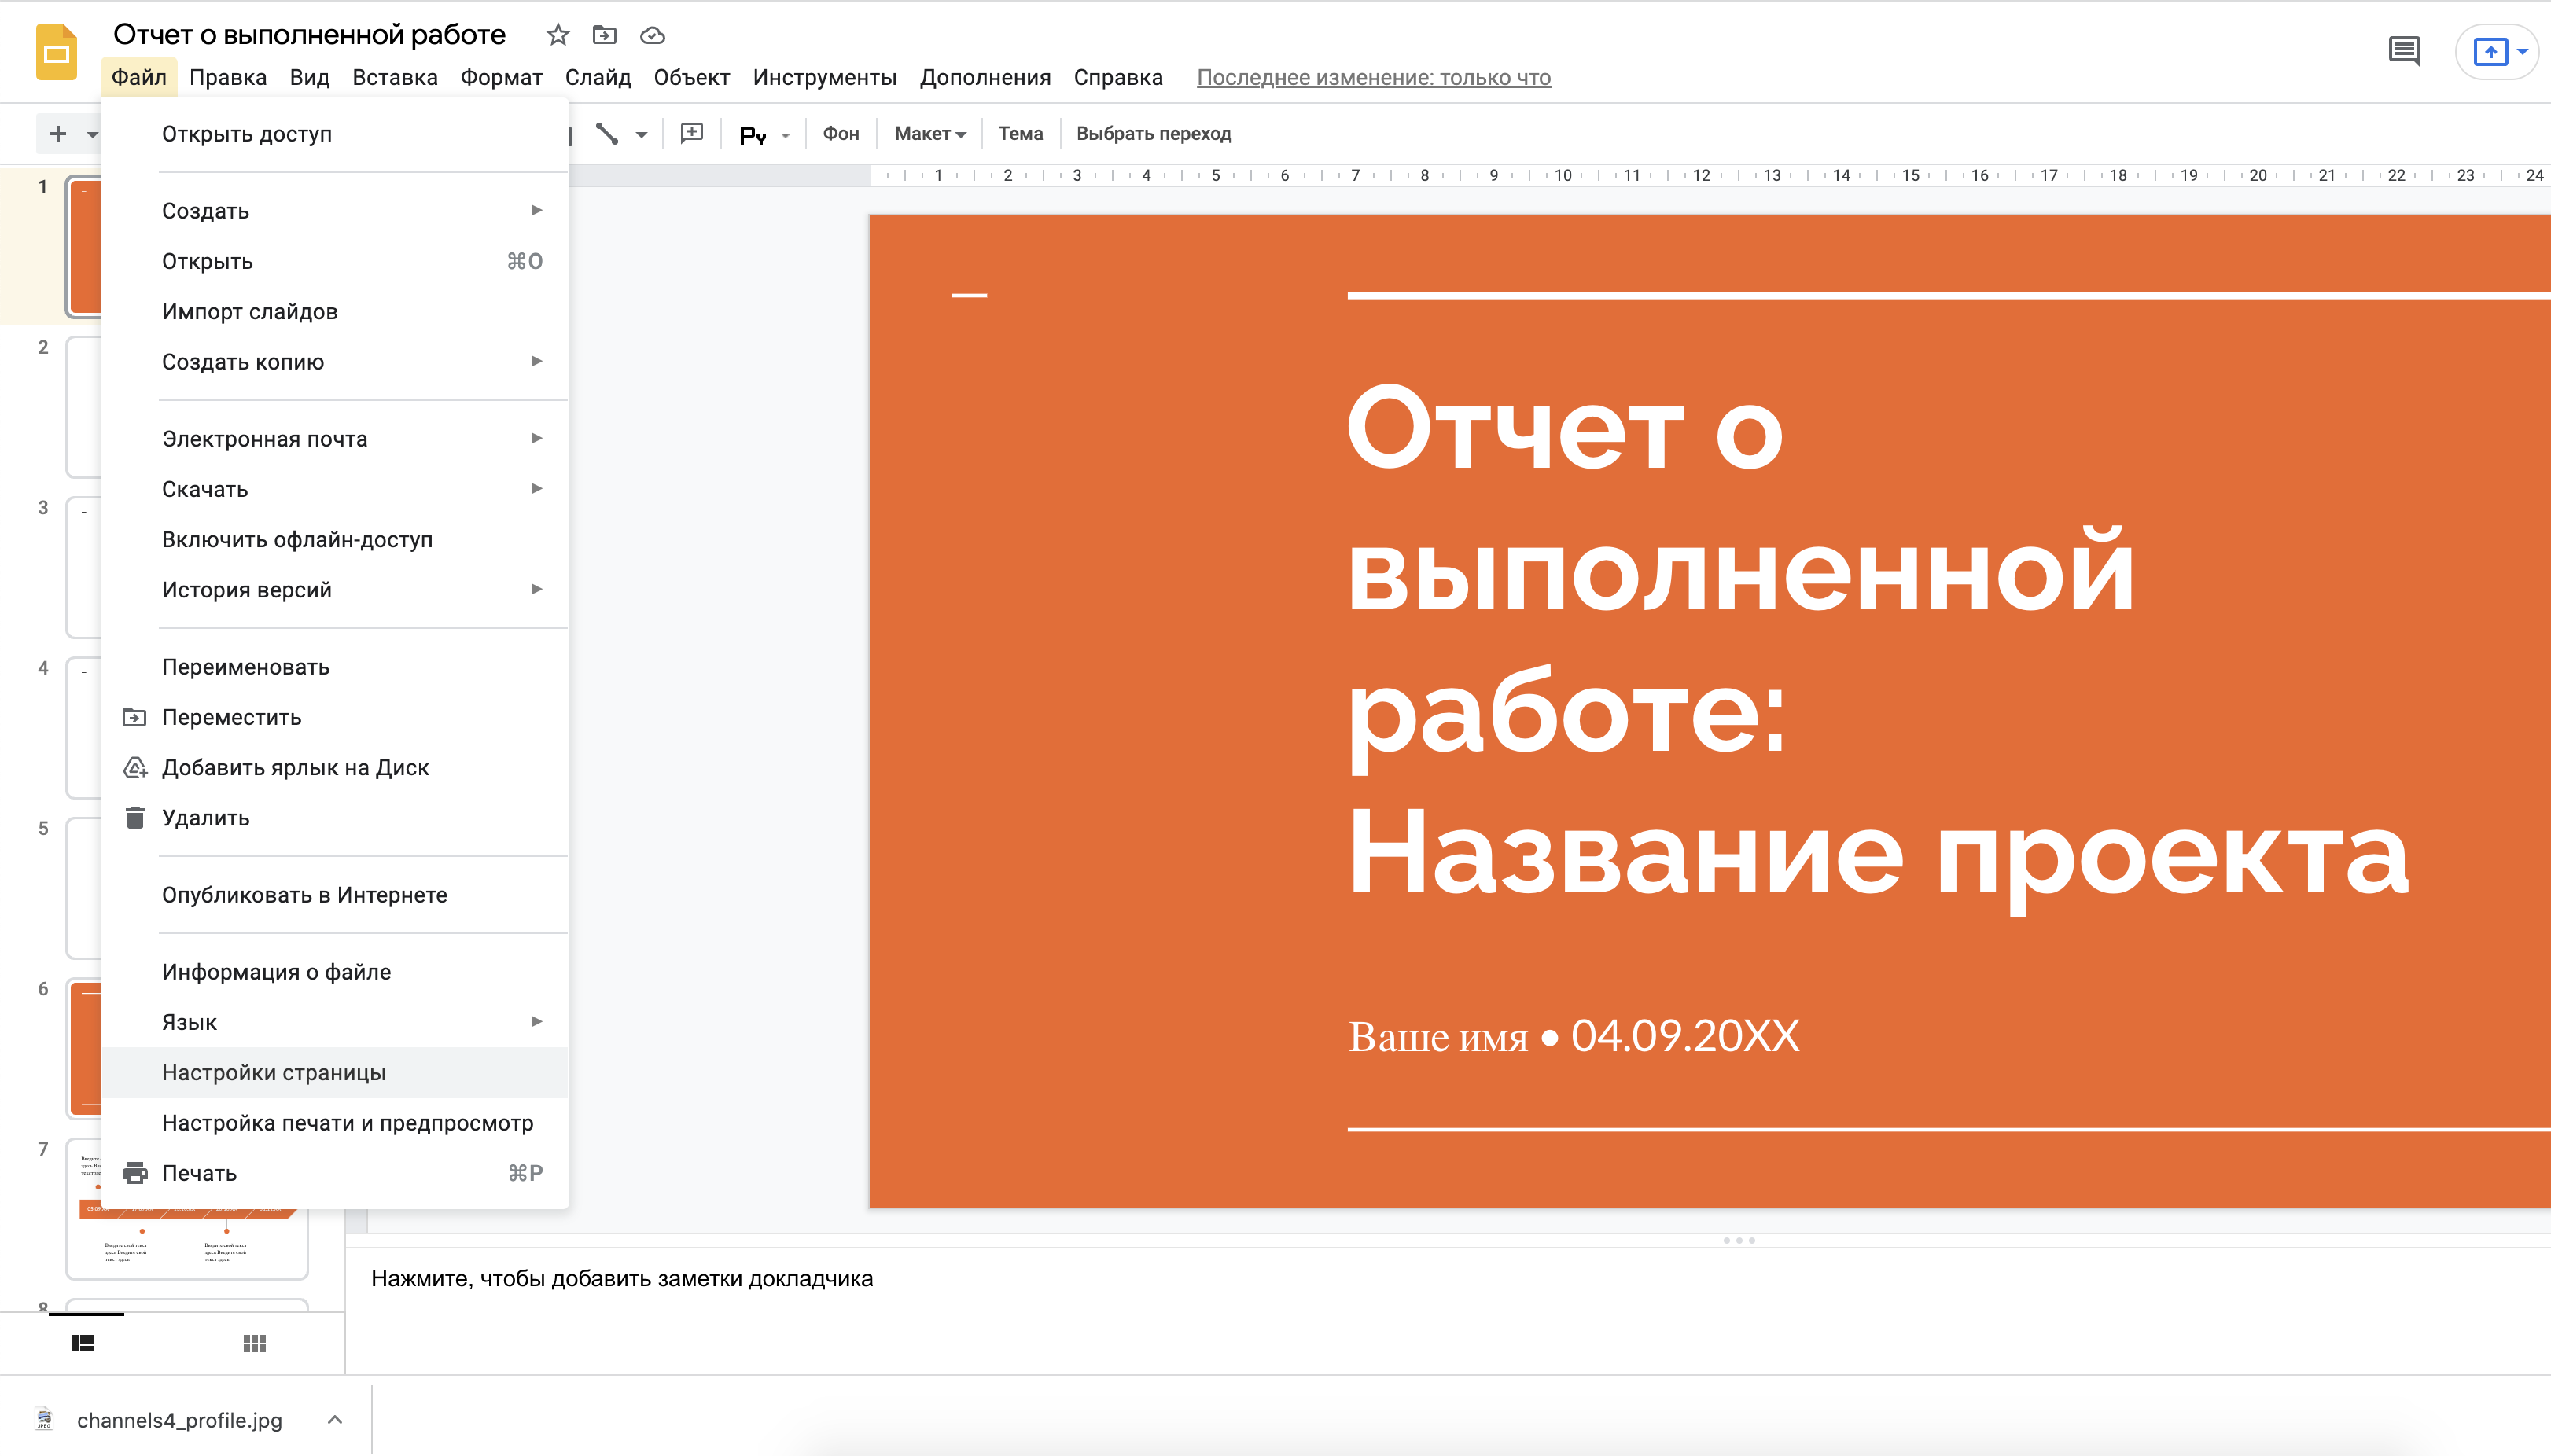 Как уменьшить вес презентации PowerPoint онлайн